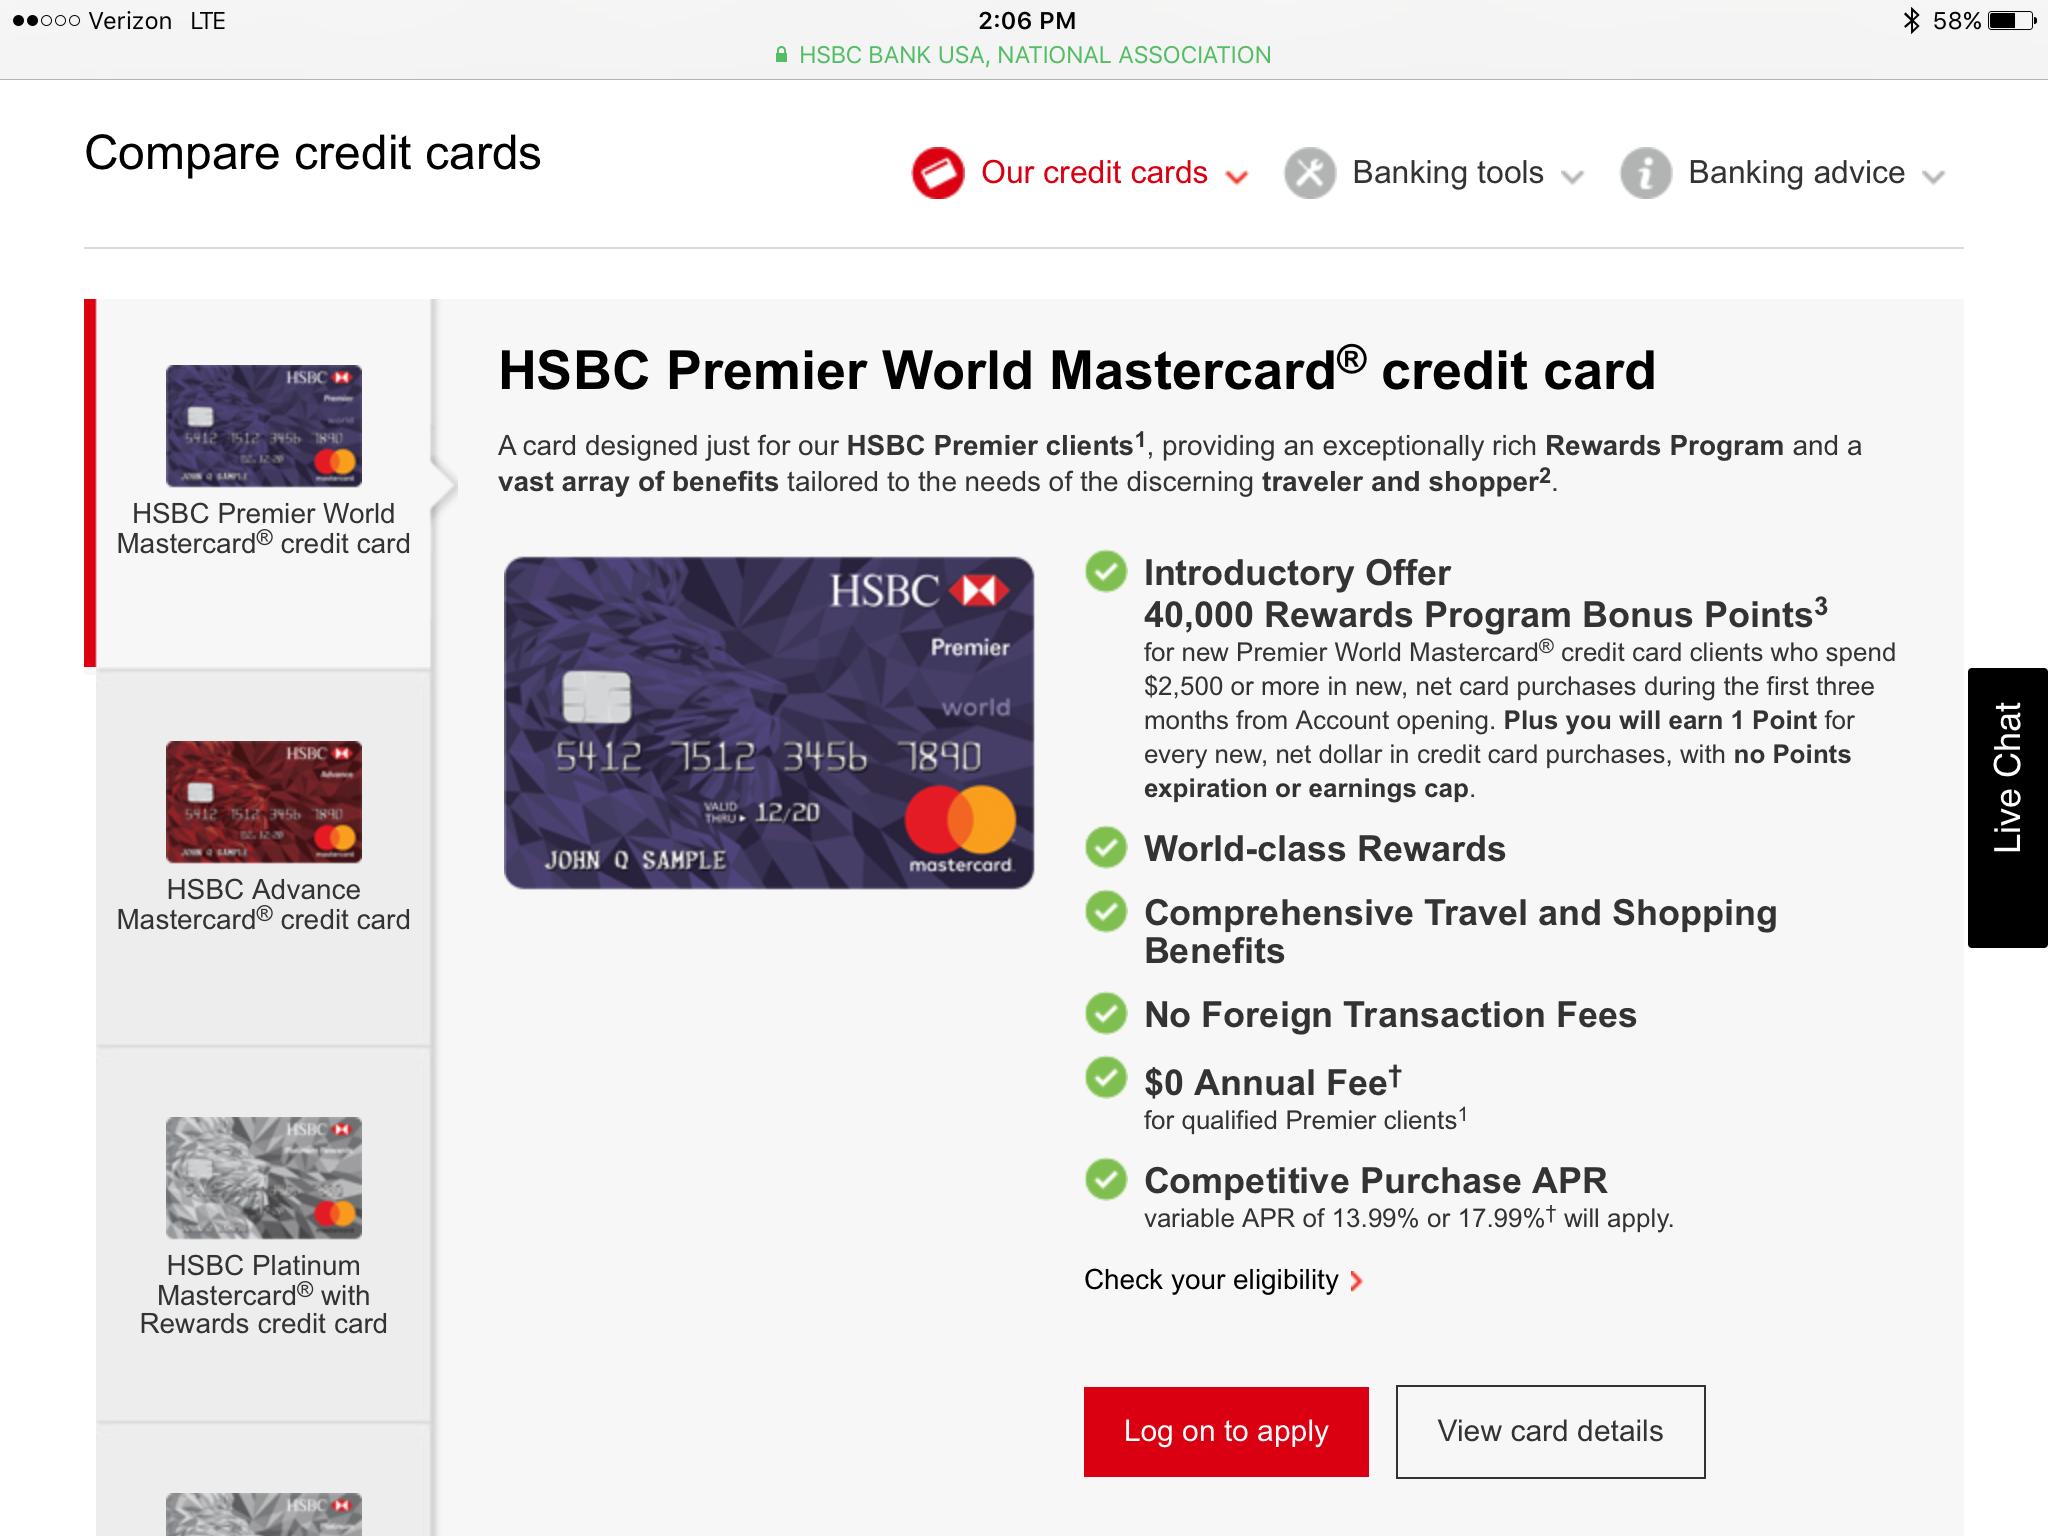 HSBC Platinum MC with Rewards,,,FREE CANDY FOLKS